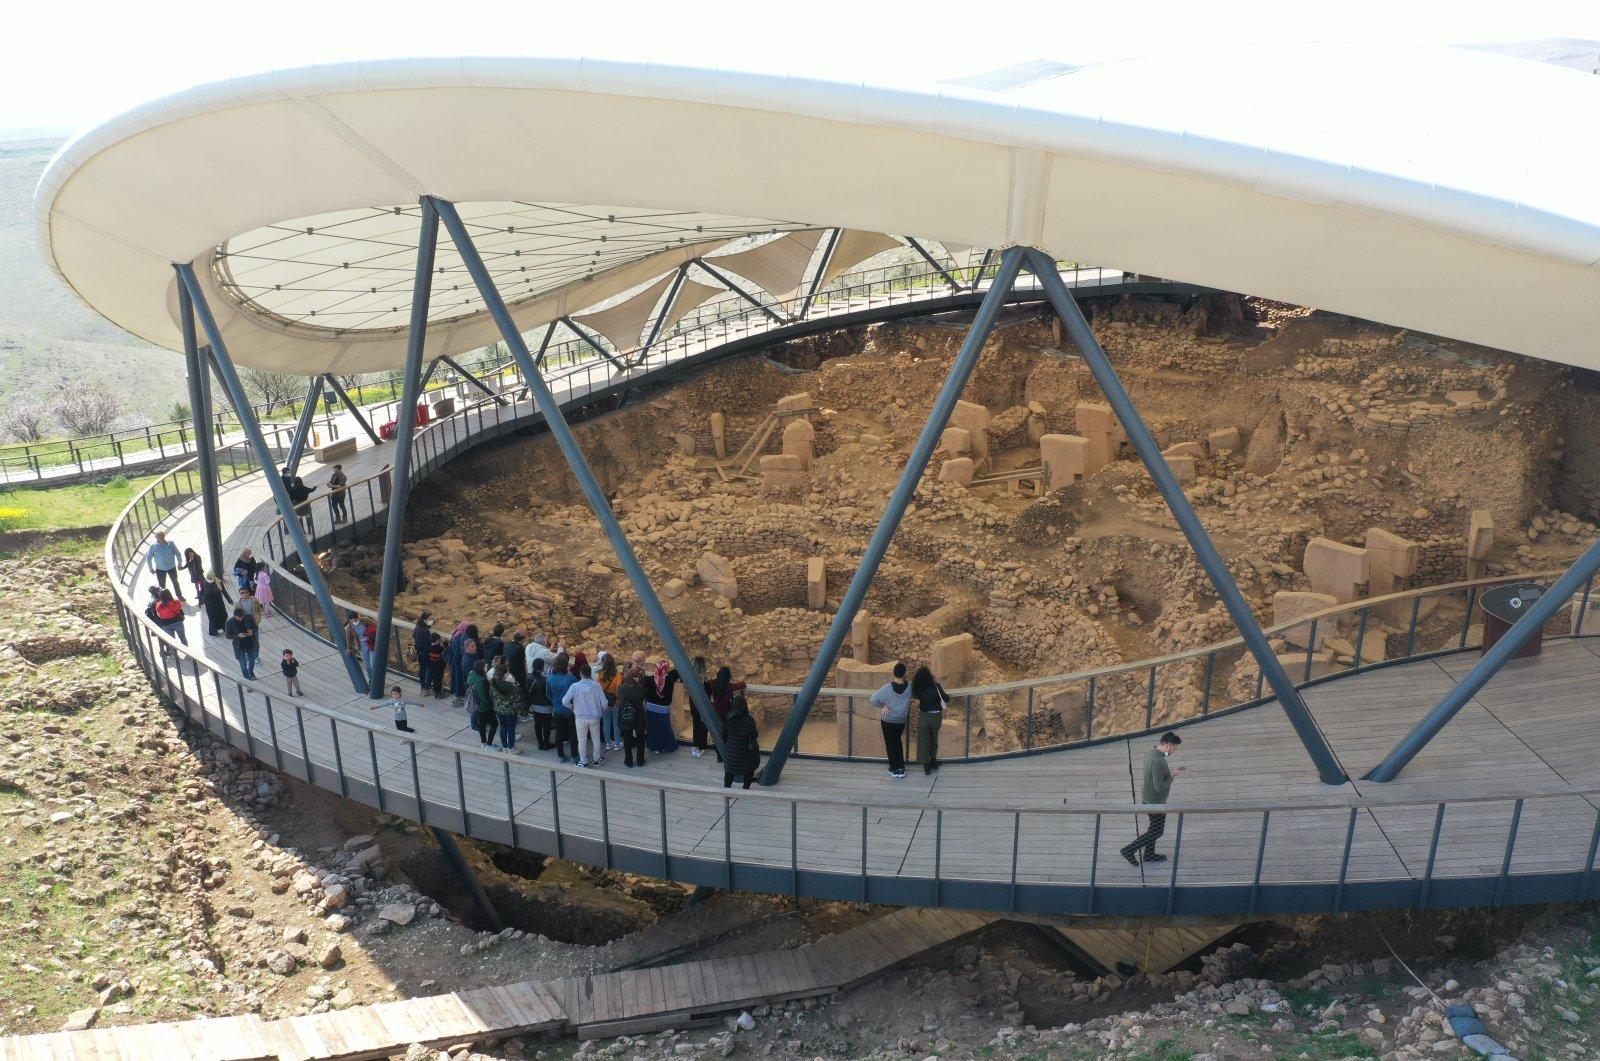 Some visitors visit the ancient site of Göbeklitepe, Şanlıurfa, southeastern Turkey, March 8, 2021. (AA Photo)